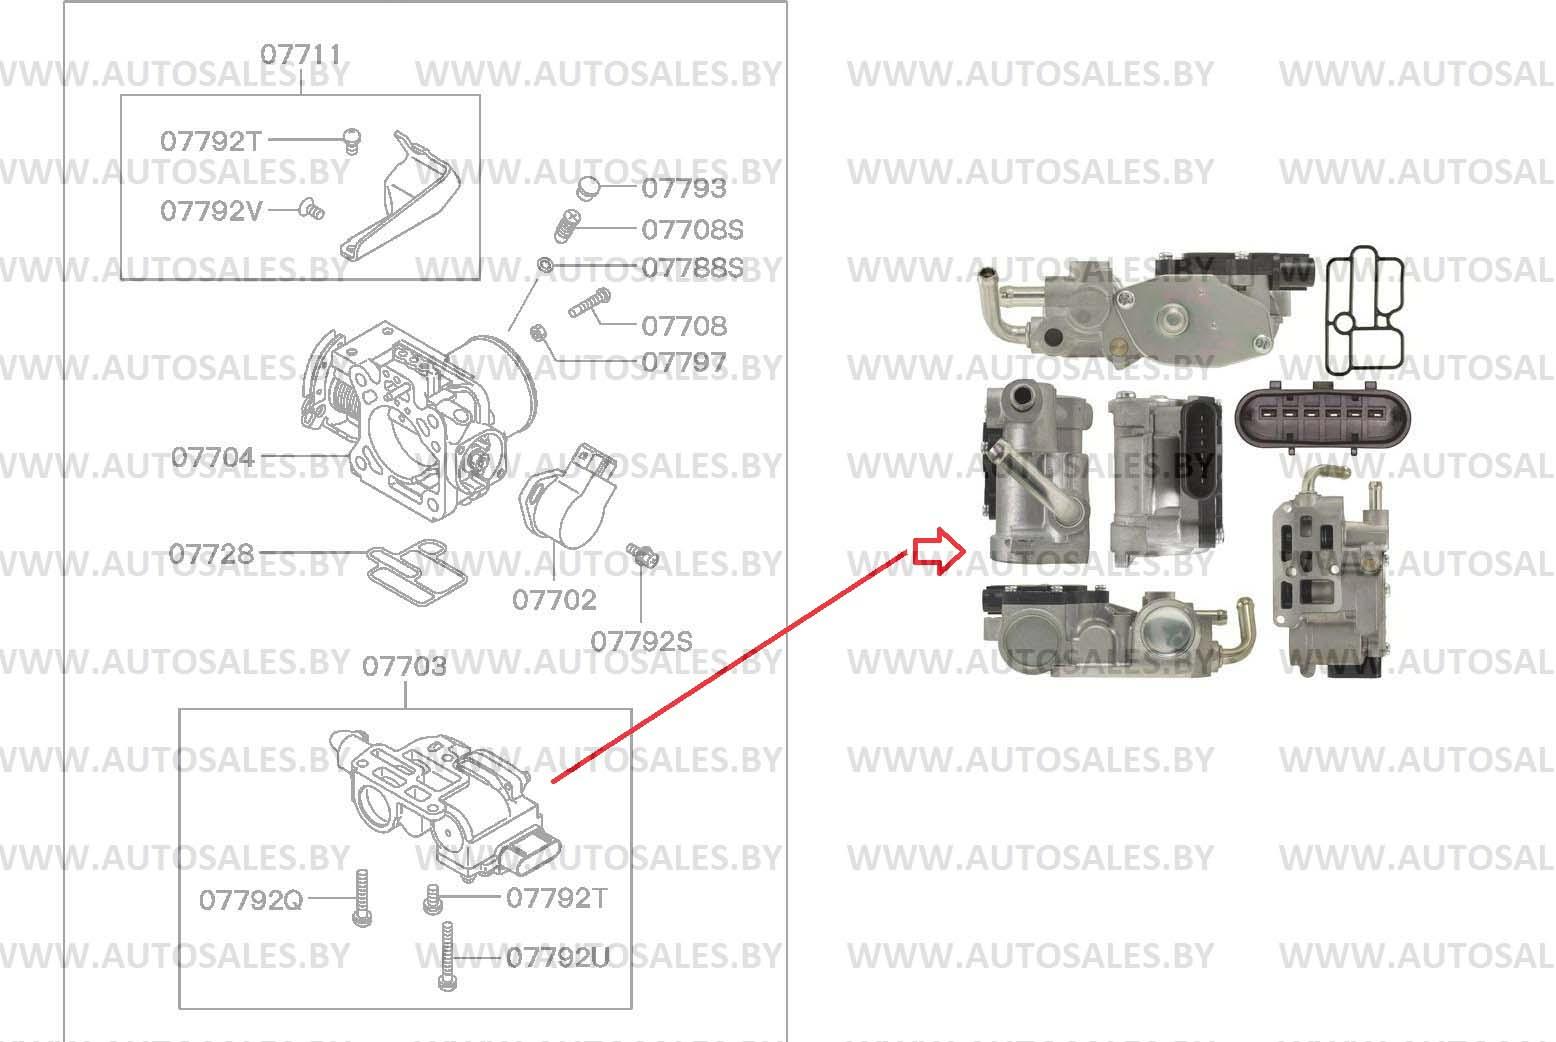 MD308047/MD 308047/AC444/MD614527/MD 614527/AC4140/2H1207